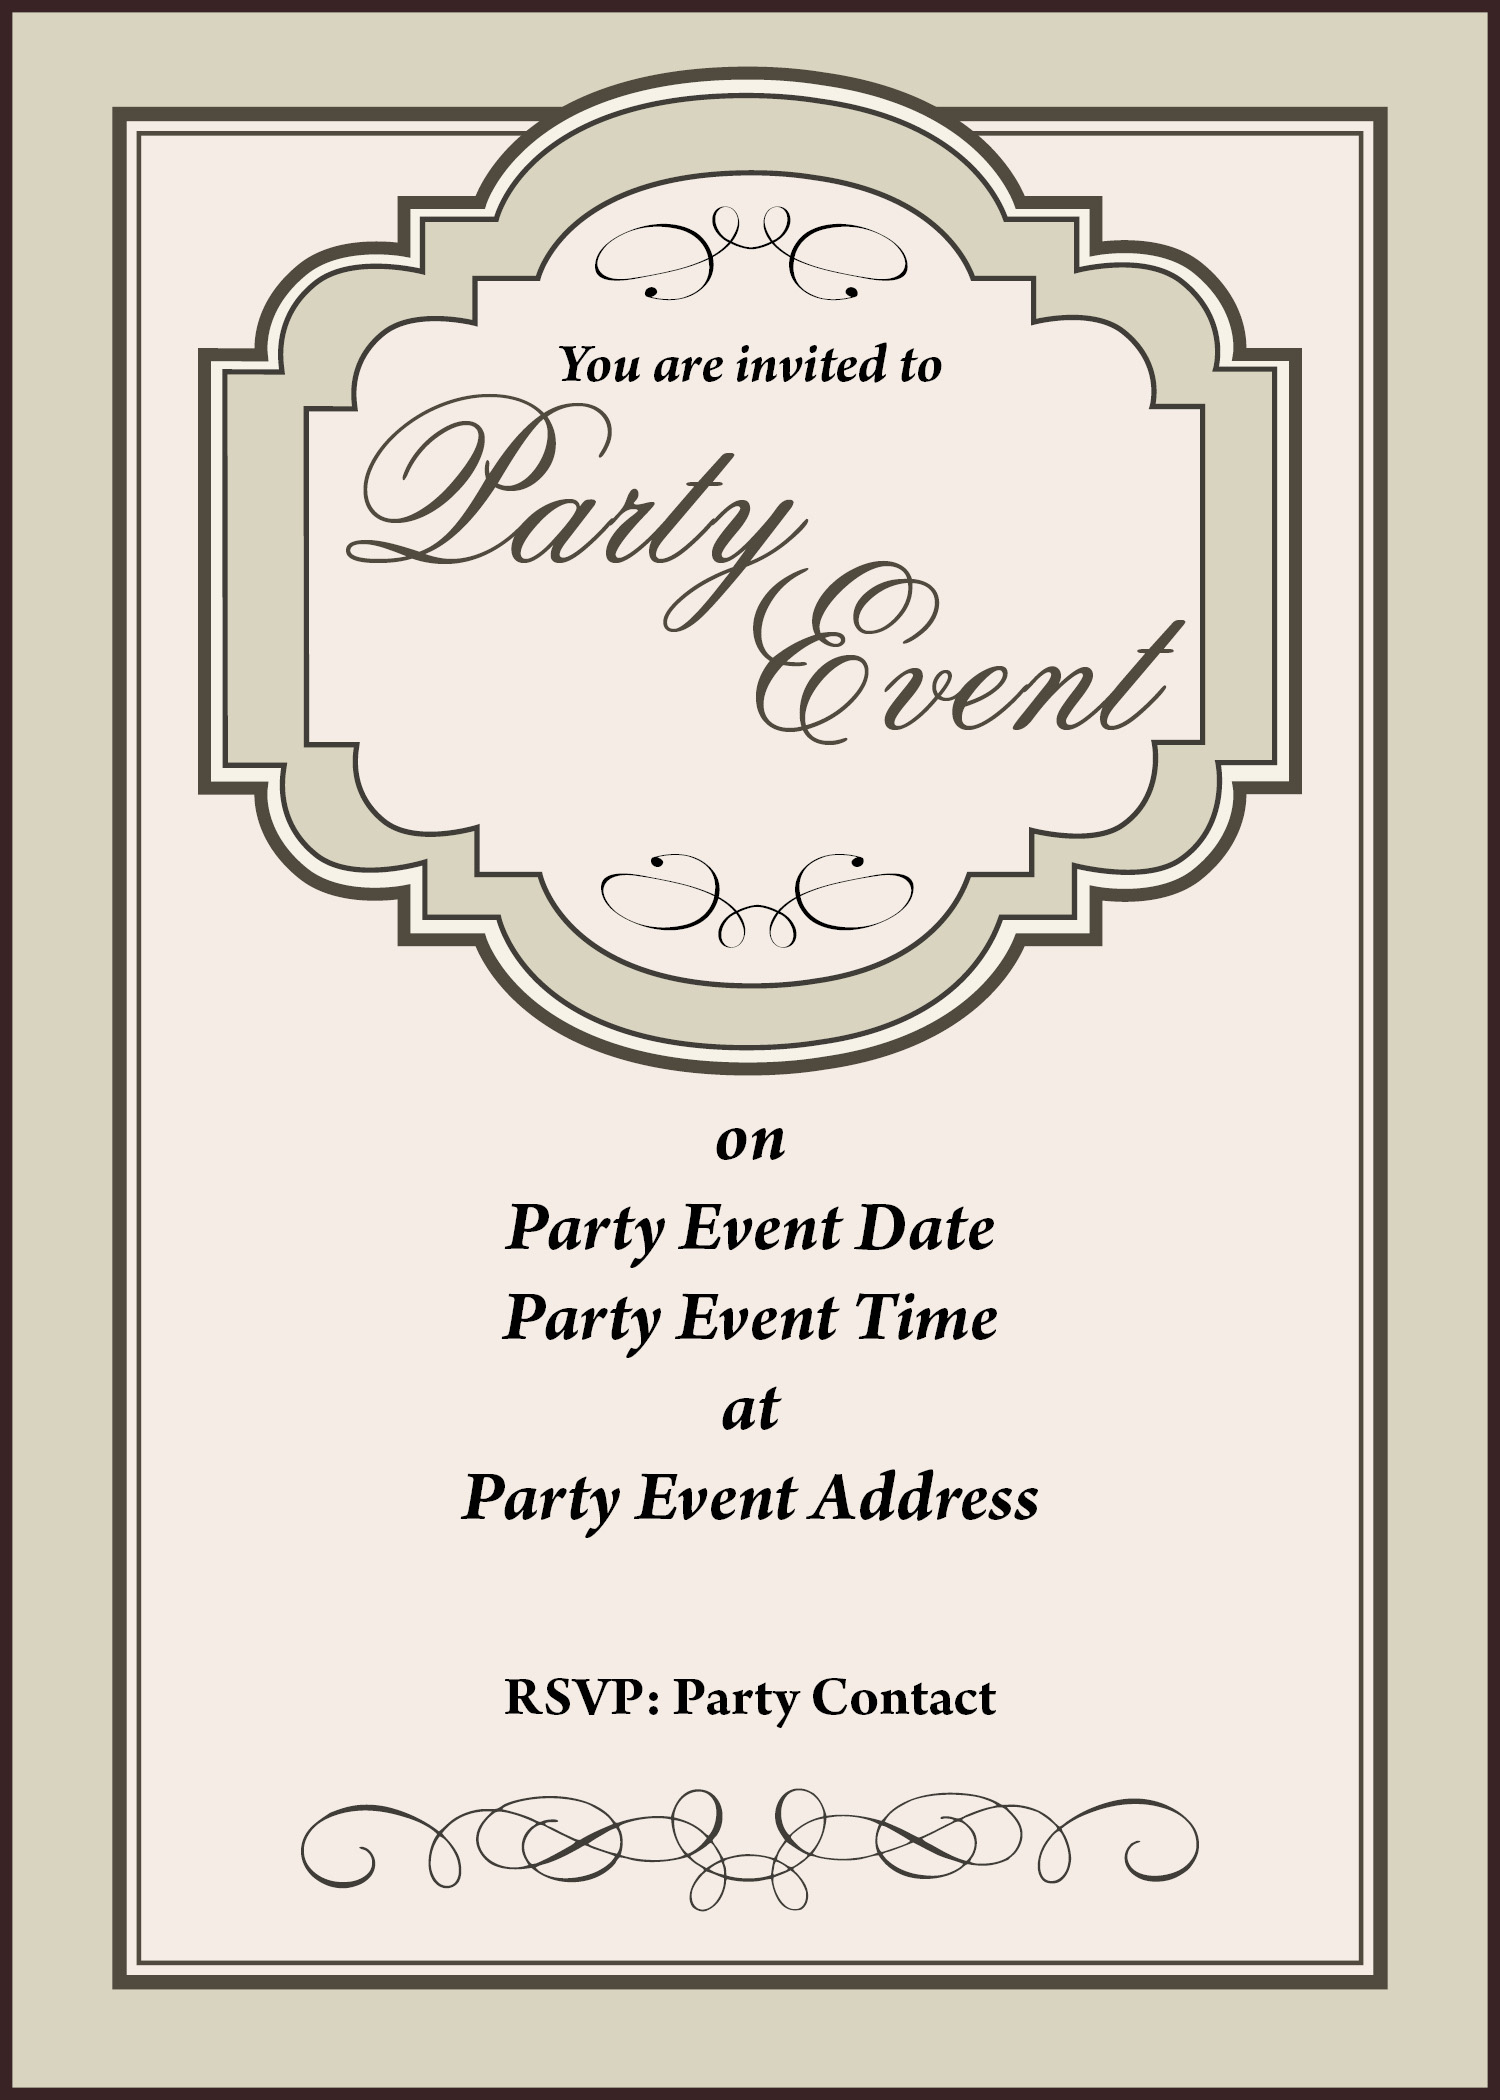 Invite 032.jpg